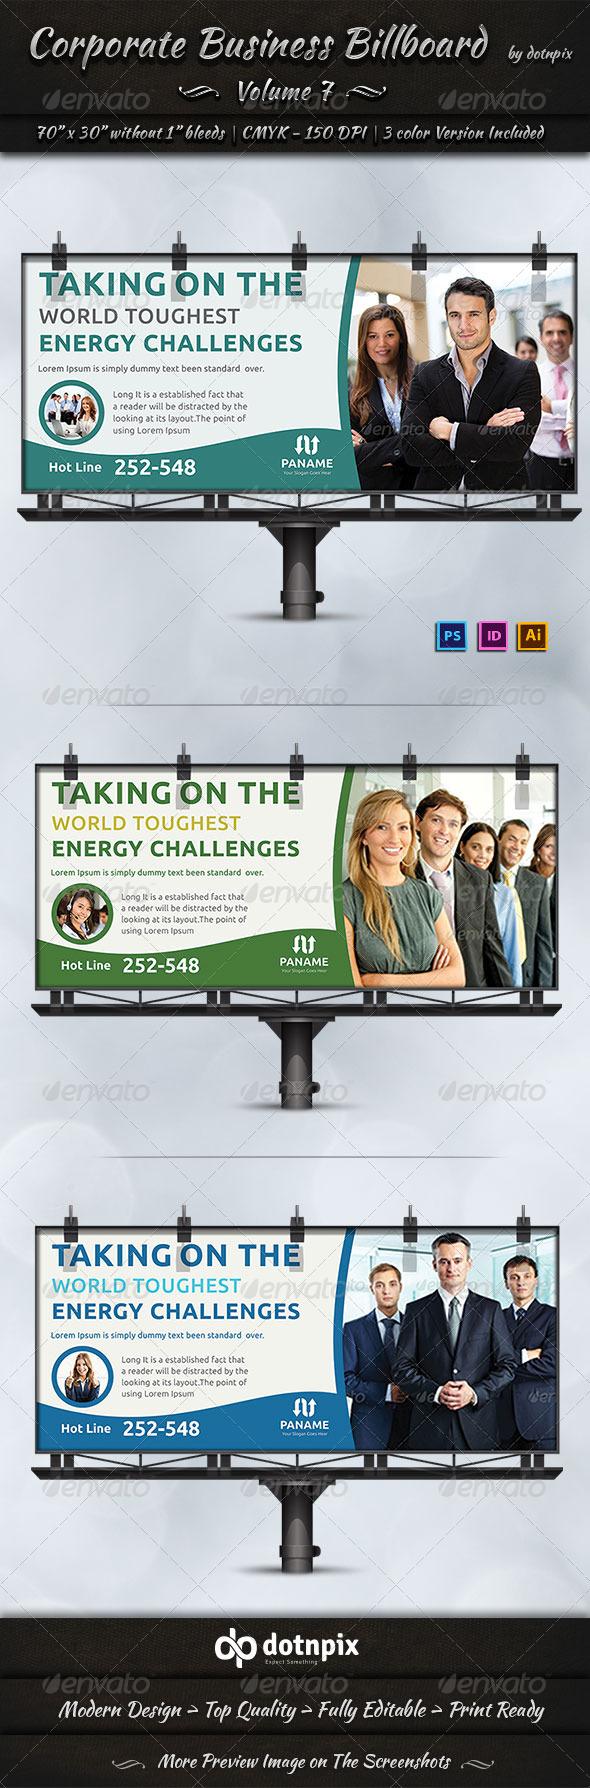 GraphicRiver Corporate Business Billboard Volume 7 6990479